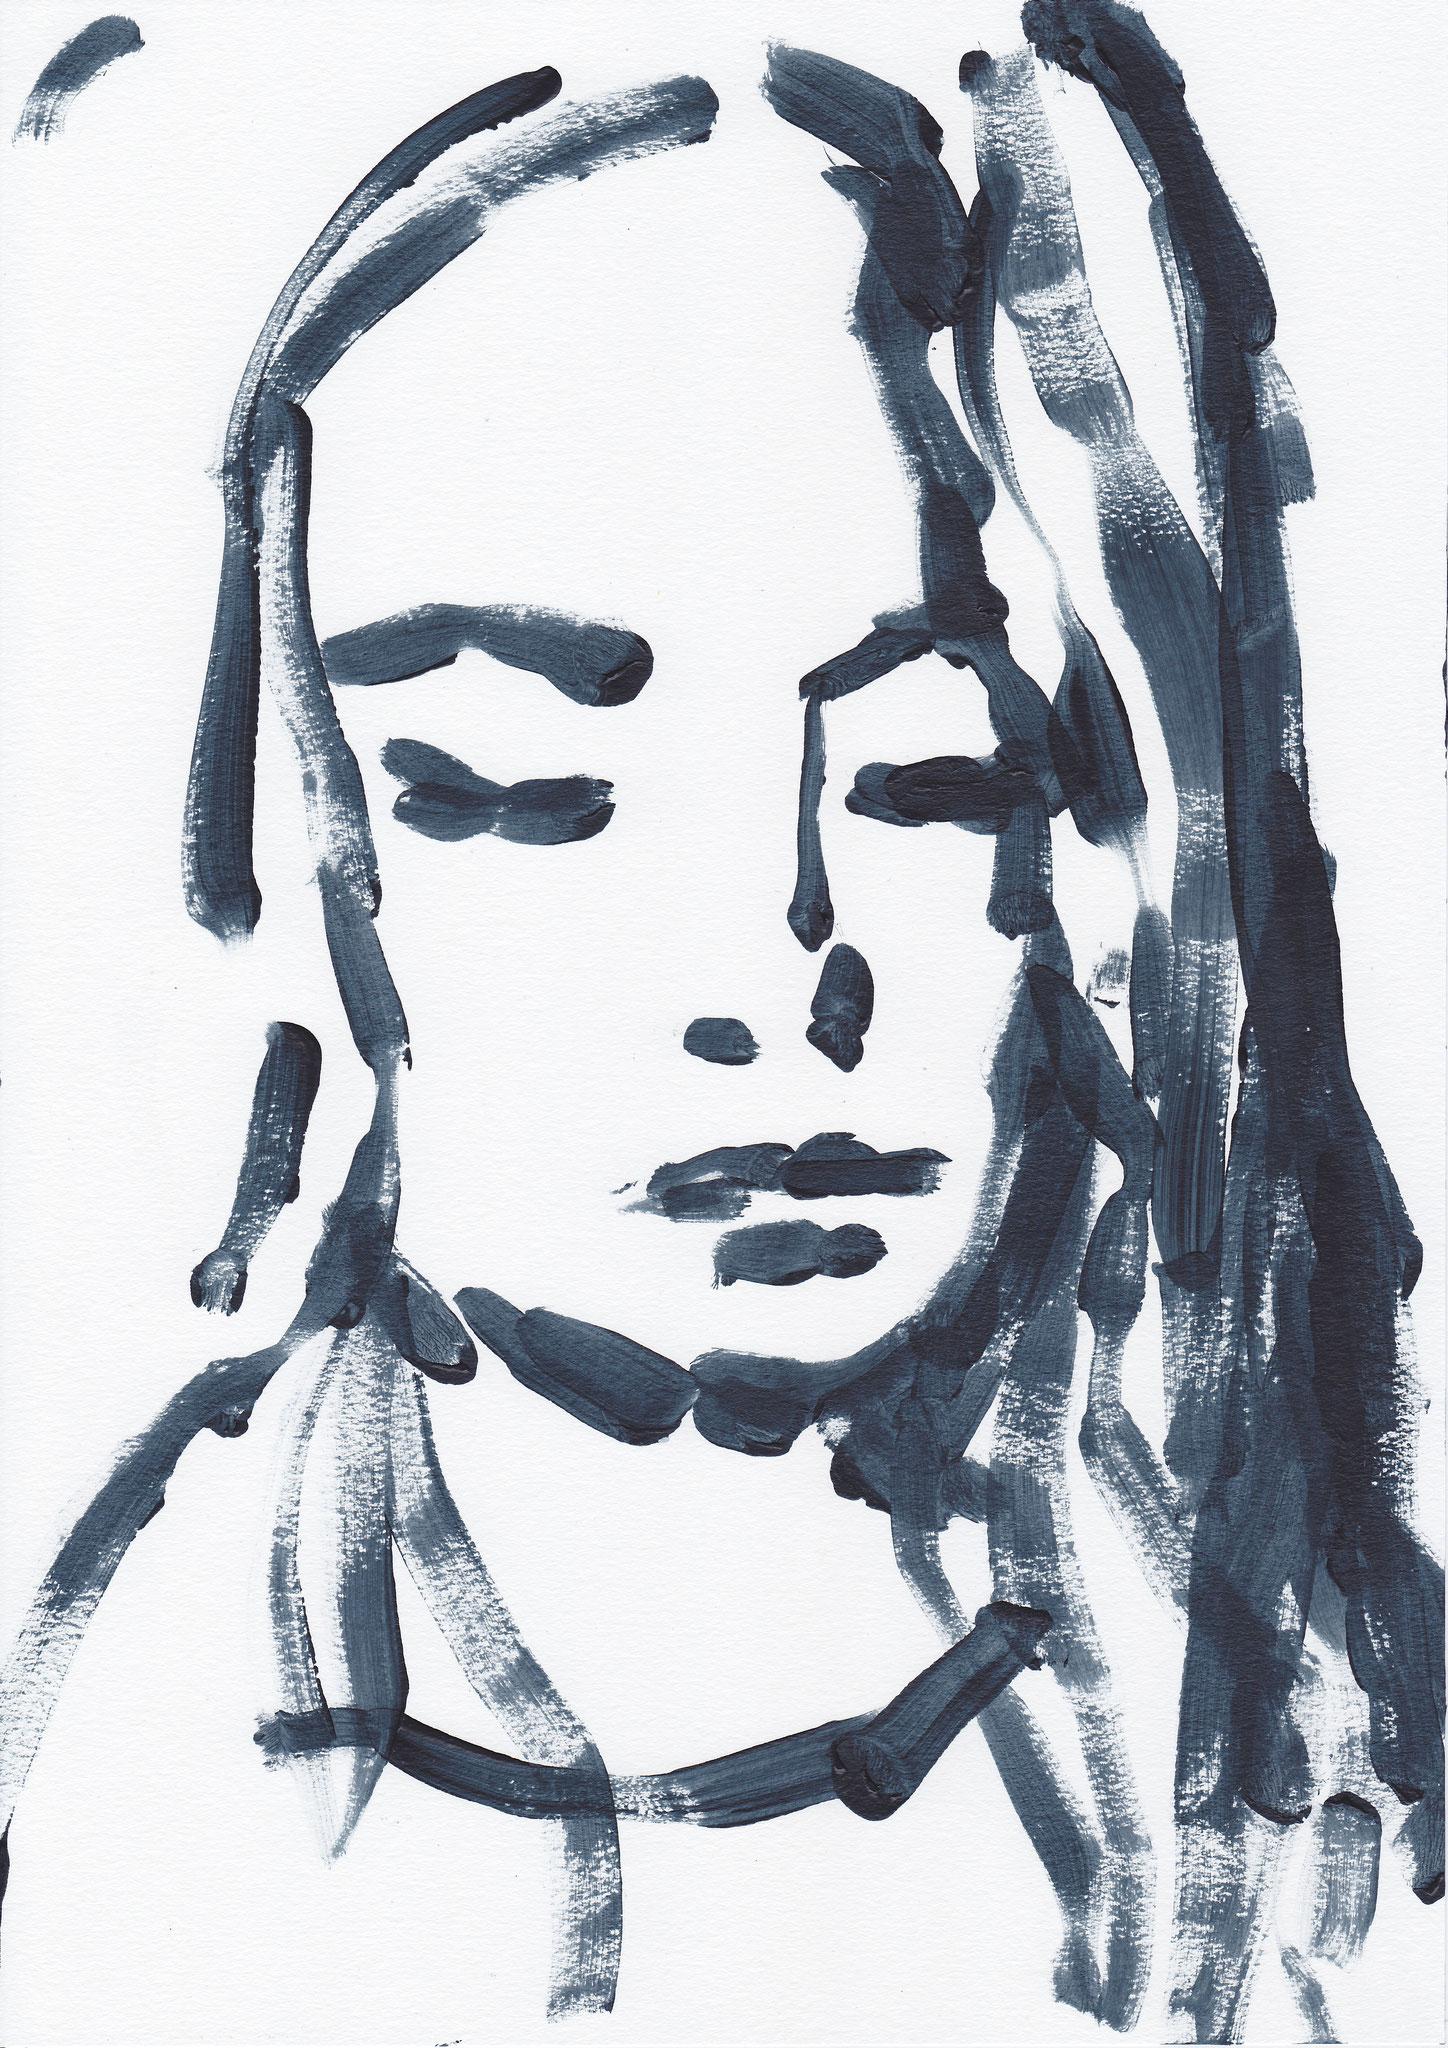 042 , acrylic on paper , 29.7 x 21cm , Selina Saranova